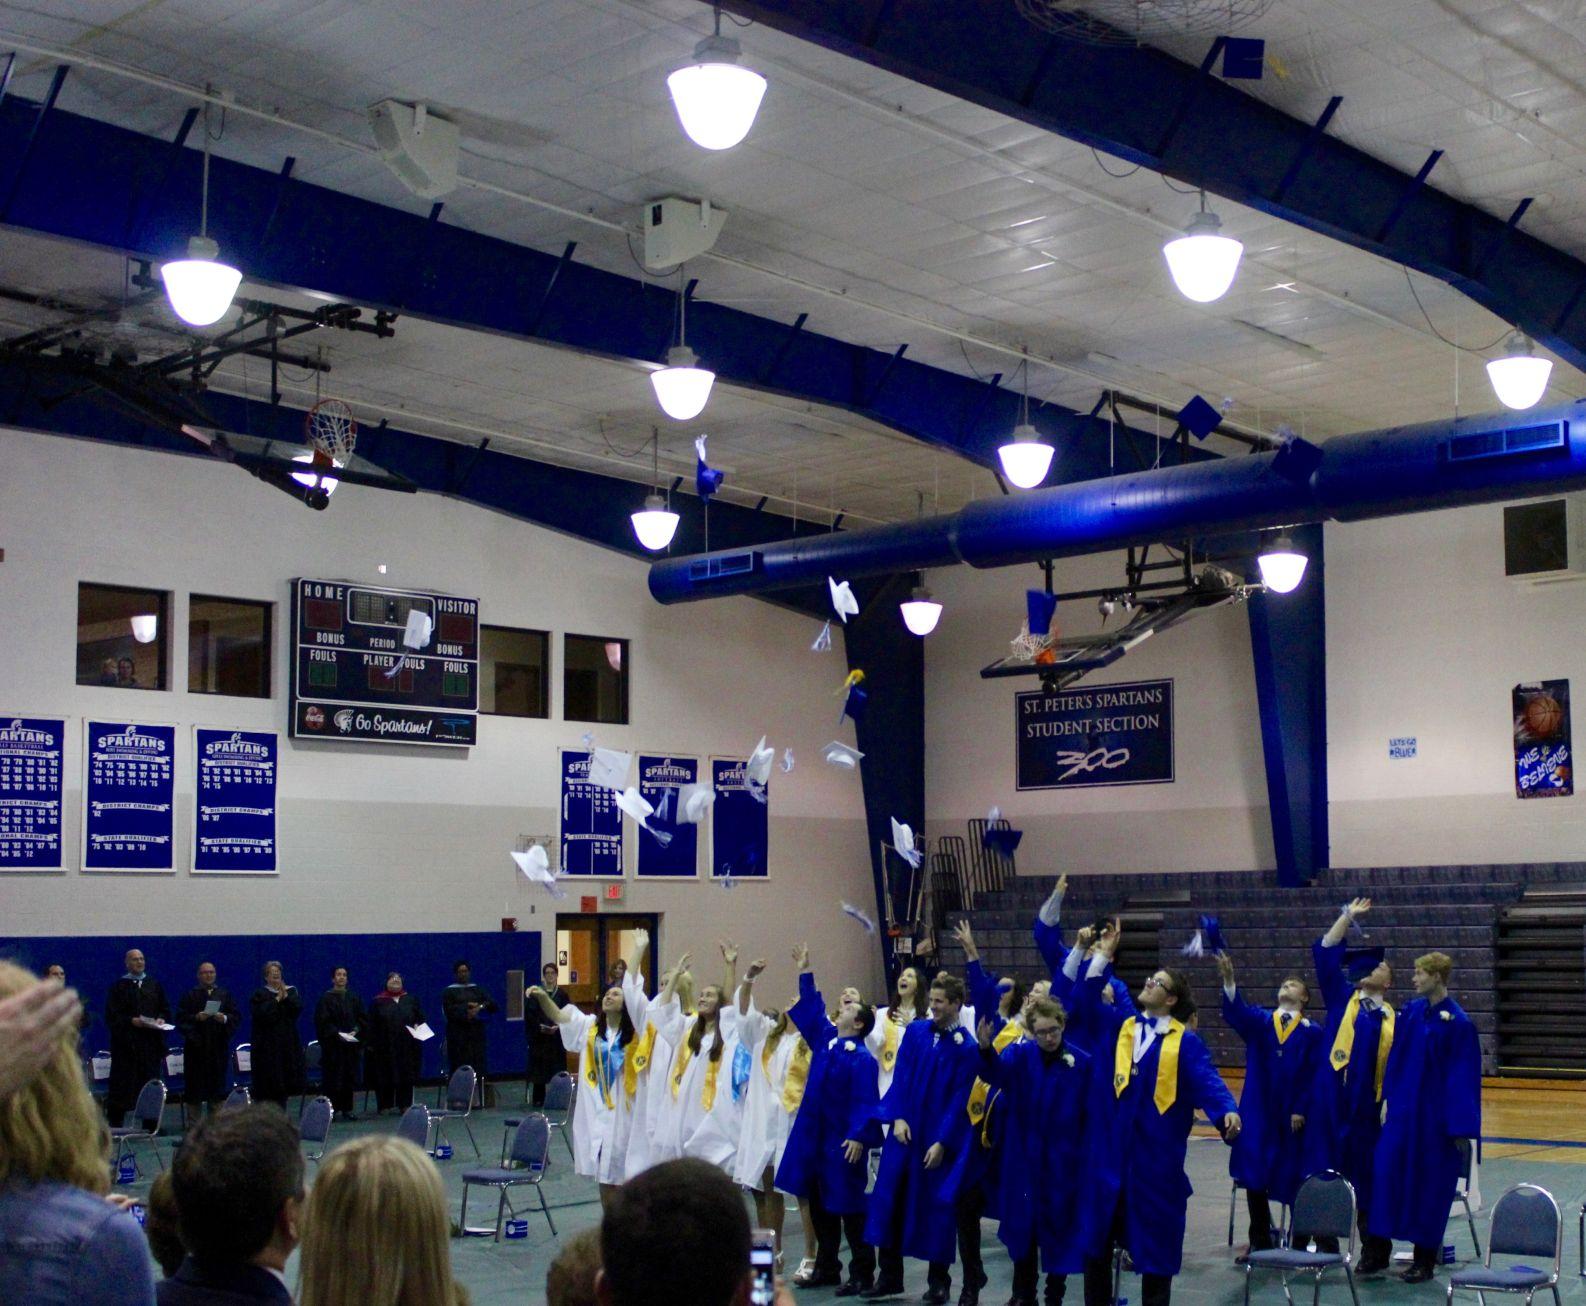 St. Peter's Graduation 2016